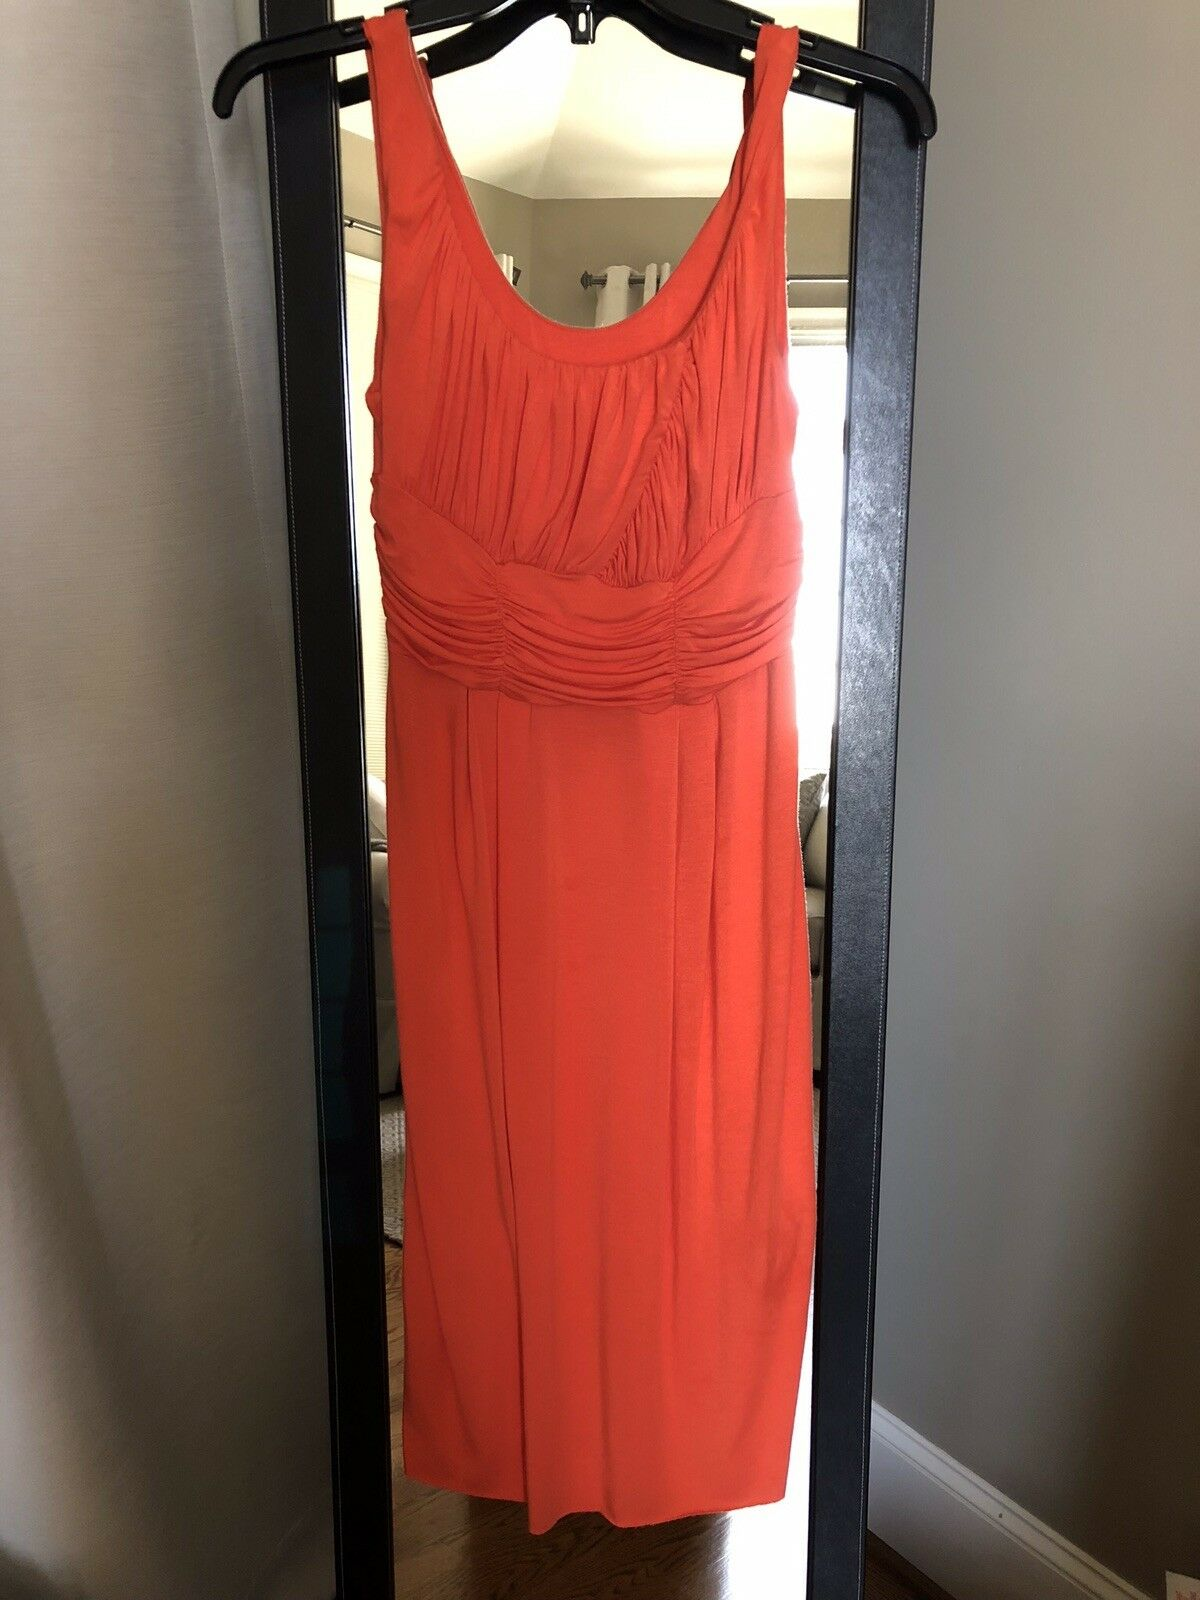 NWT Rachel Pally tank dress in orange Size Small